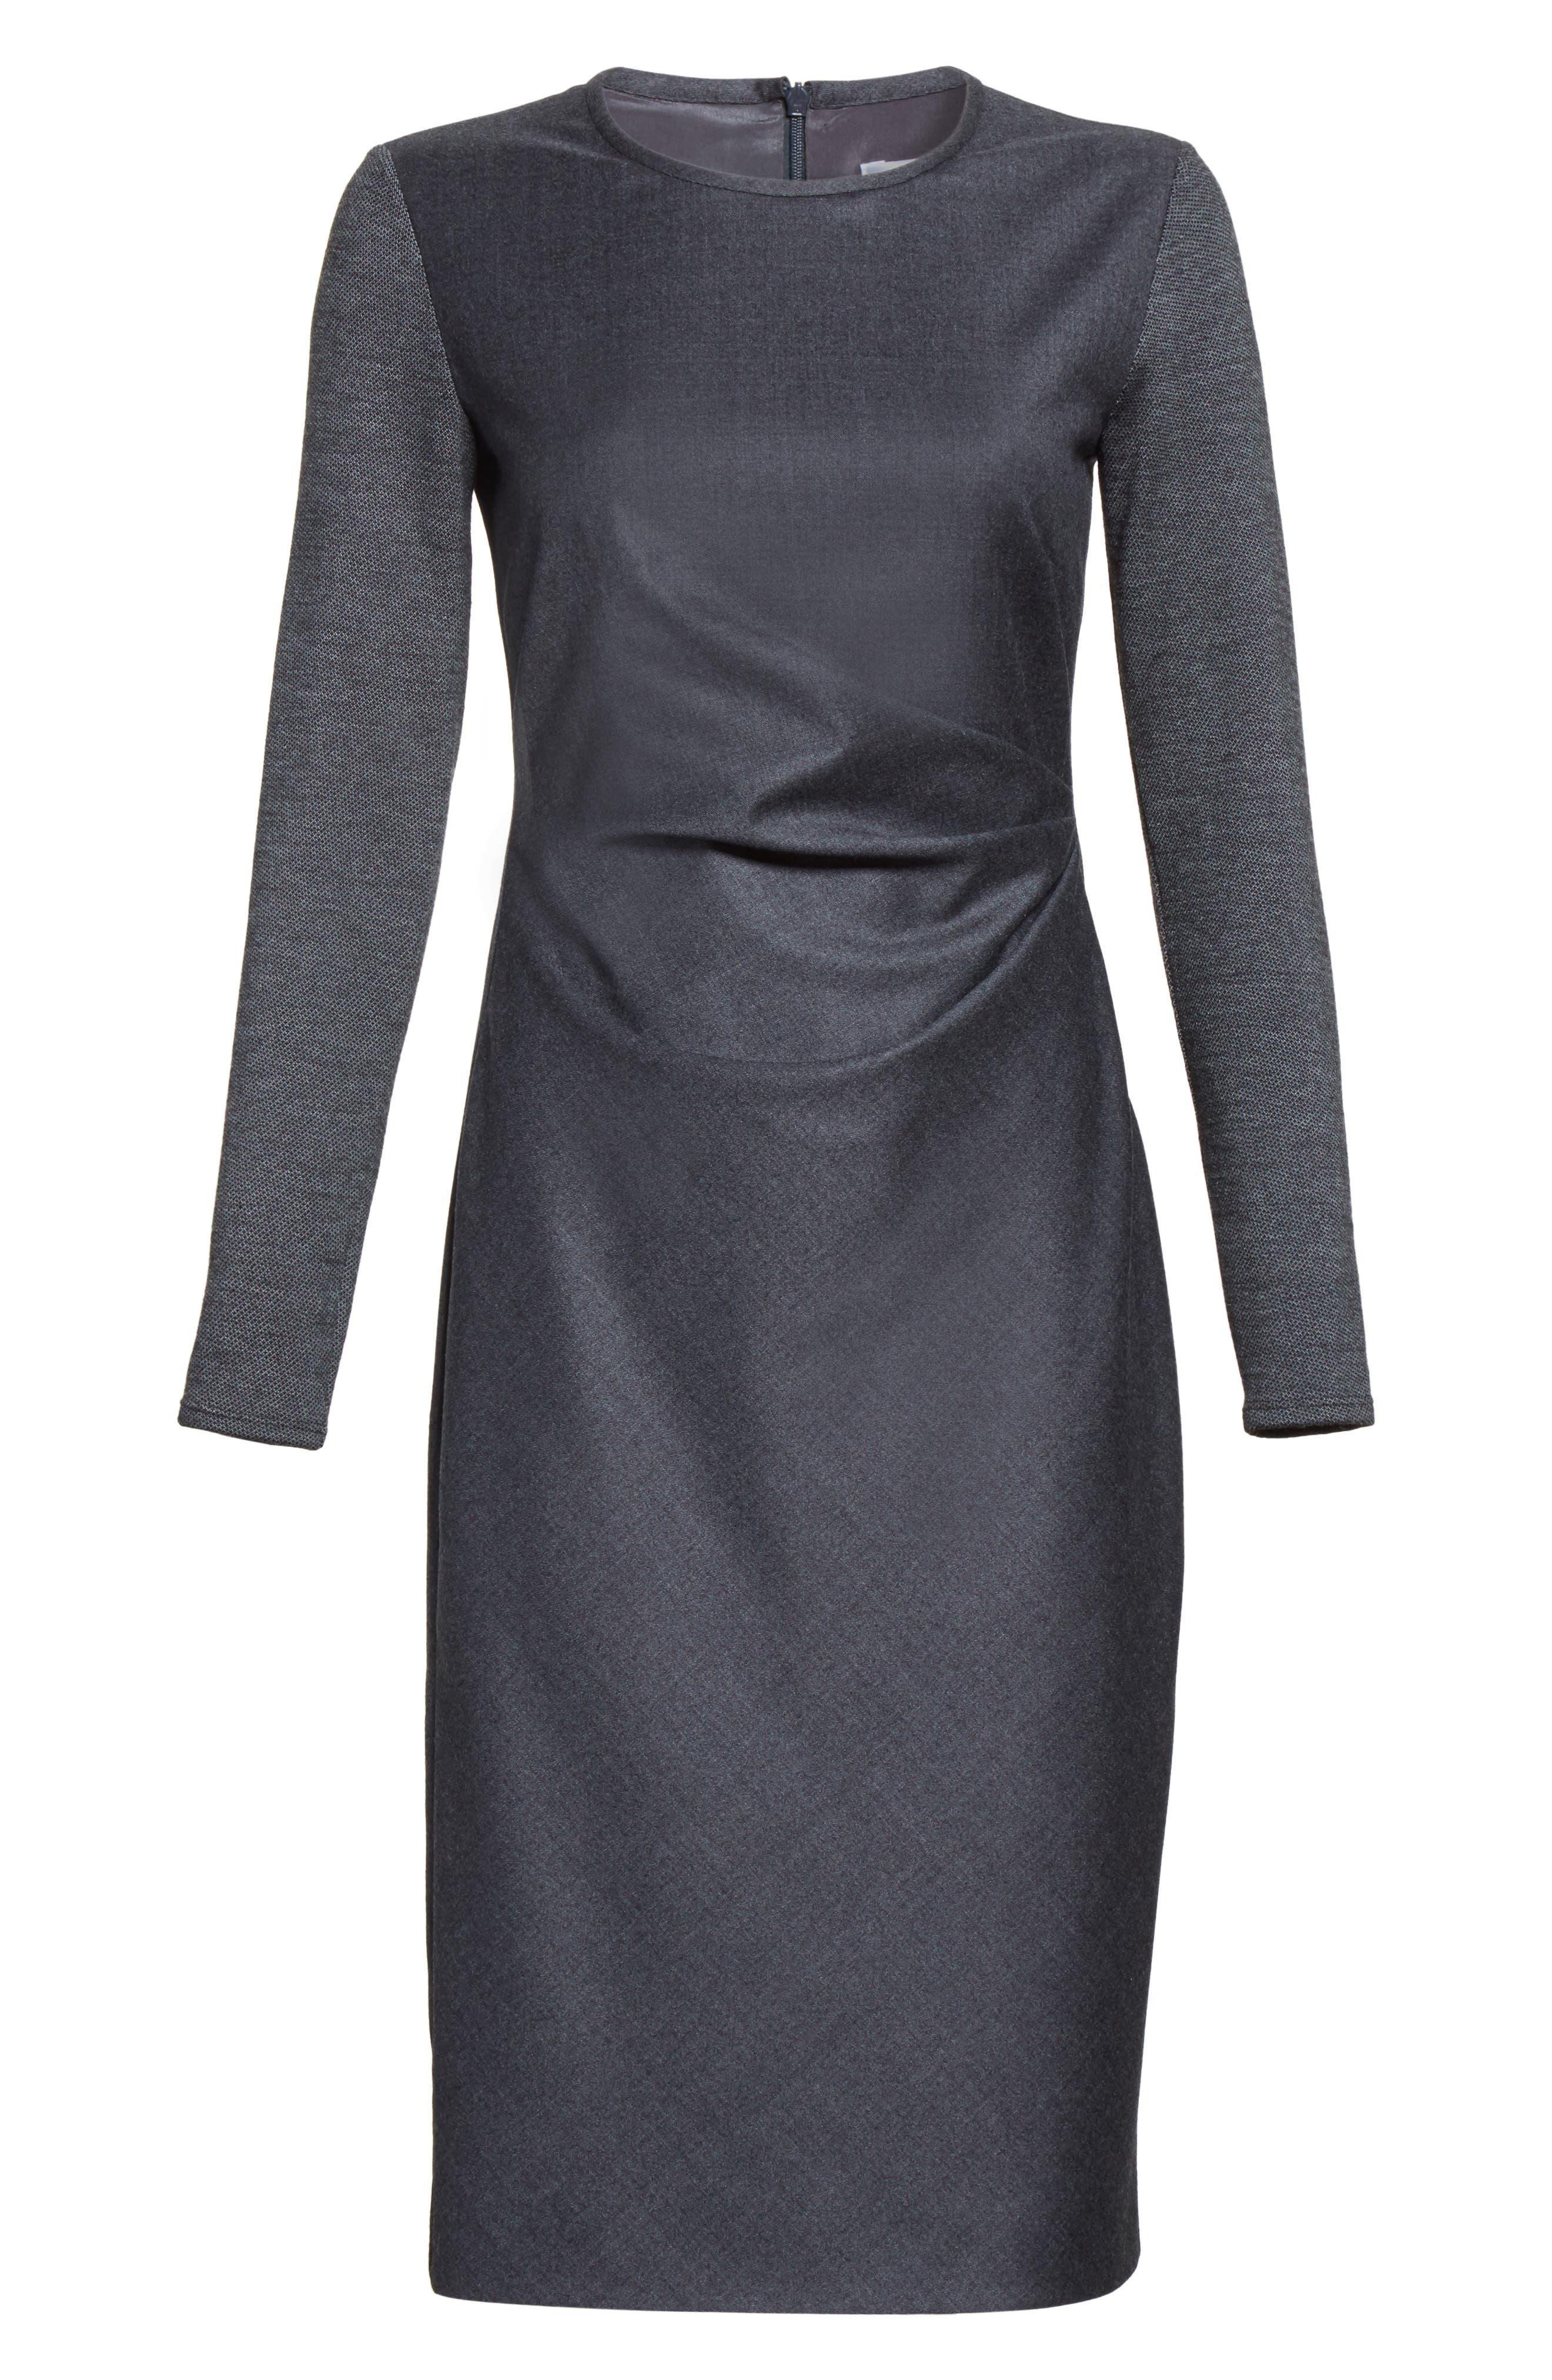 Ragazza Gathered Wool Dress,                             Alternate thumbnail 4, color,                             Dark Grey